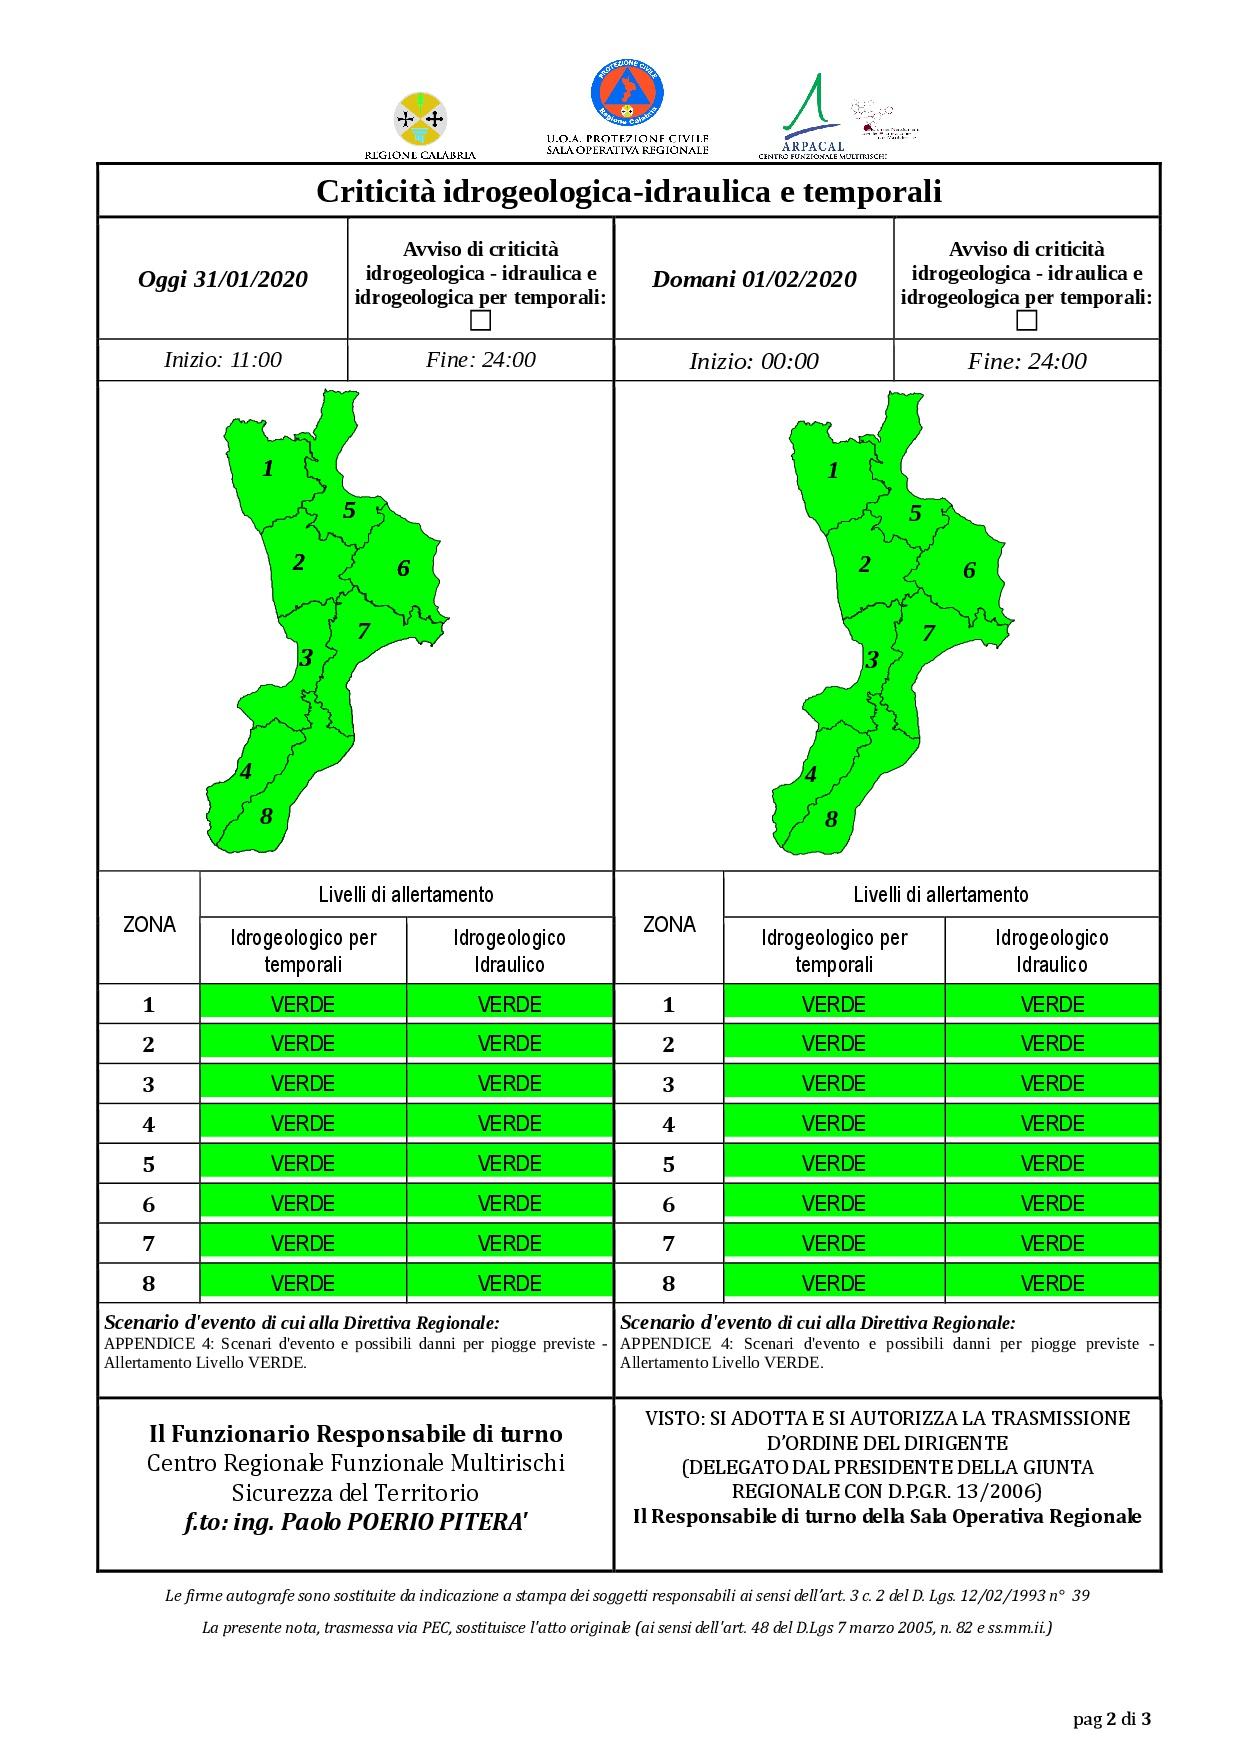 Criticità idrogeologica-idraulica e temporali in Calabria 31-01-2020